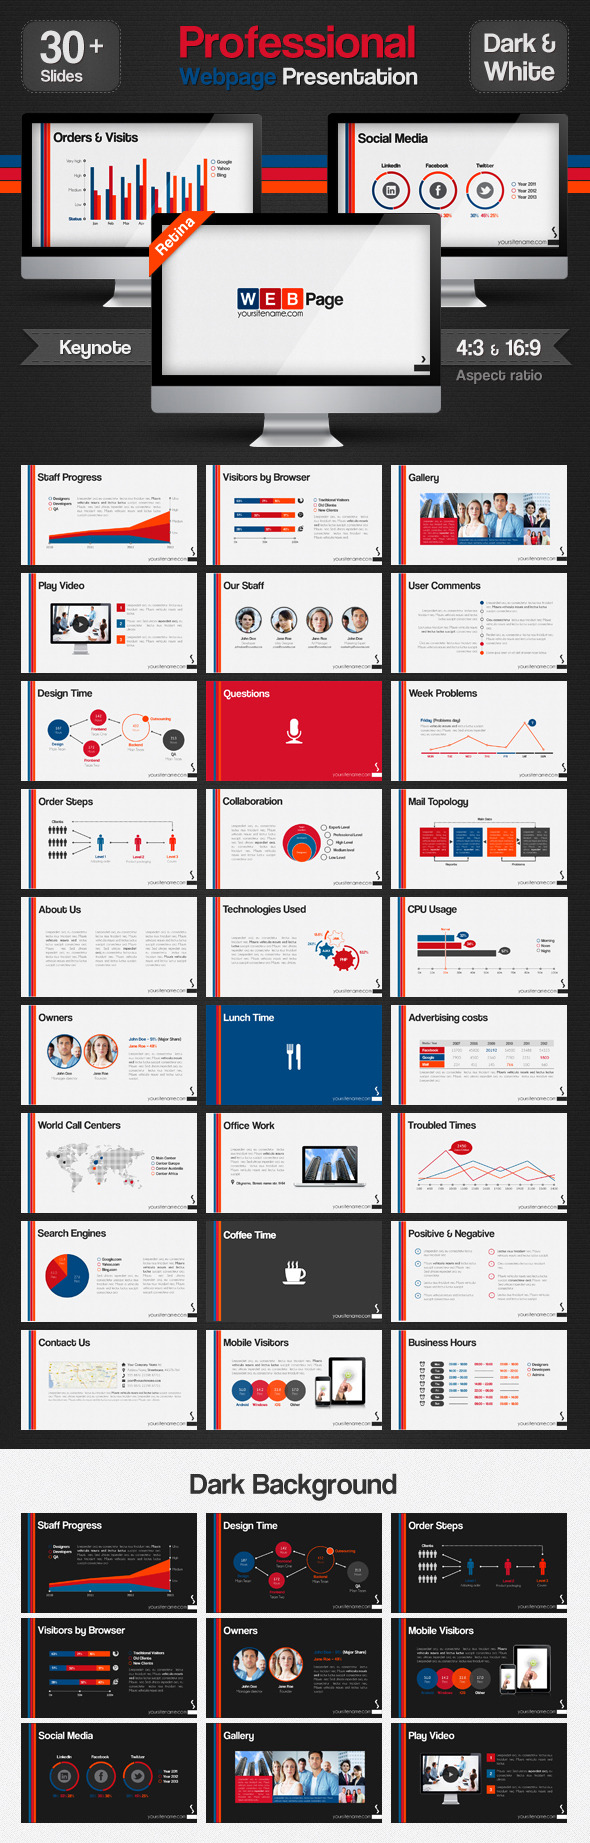 Professional Web Page Presentation Keynote - Business Keynote Templates